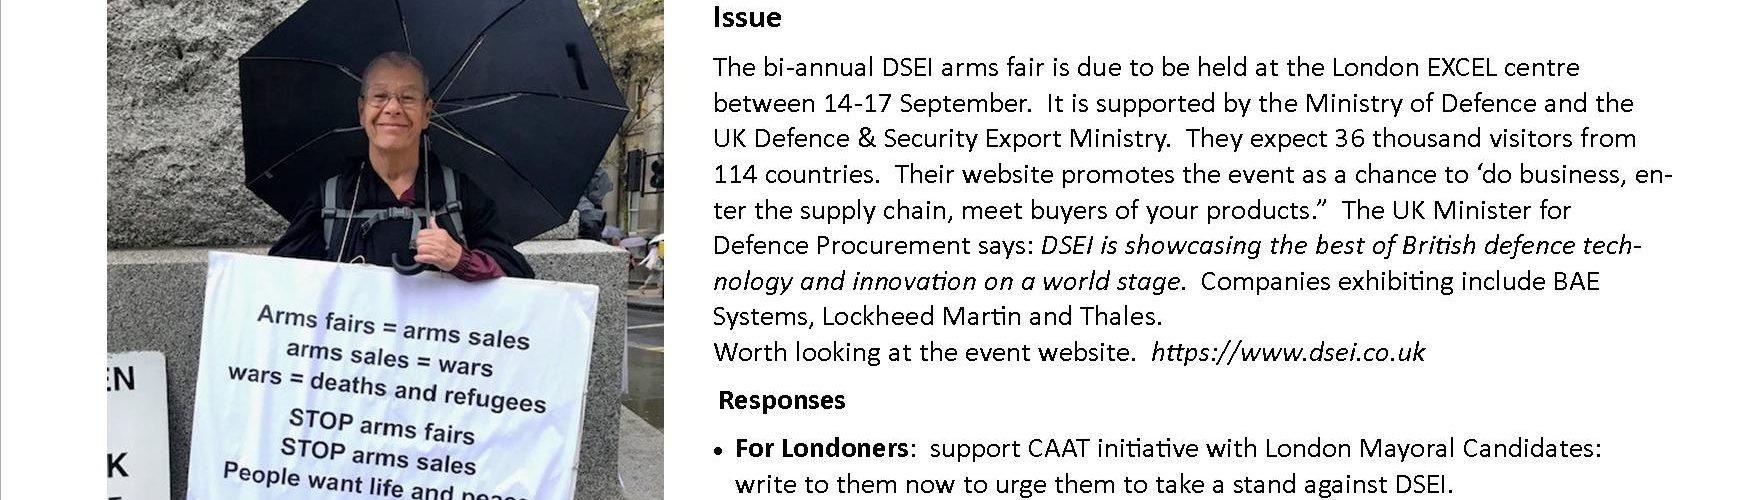 Photo and text alert to DSEI arms fair